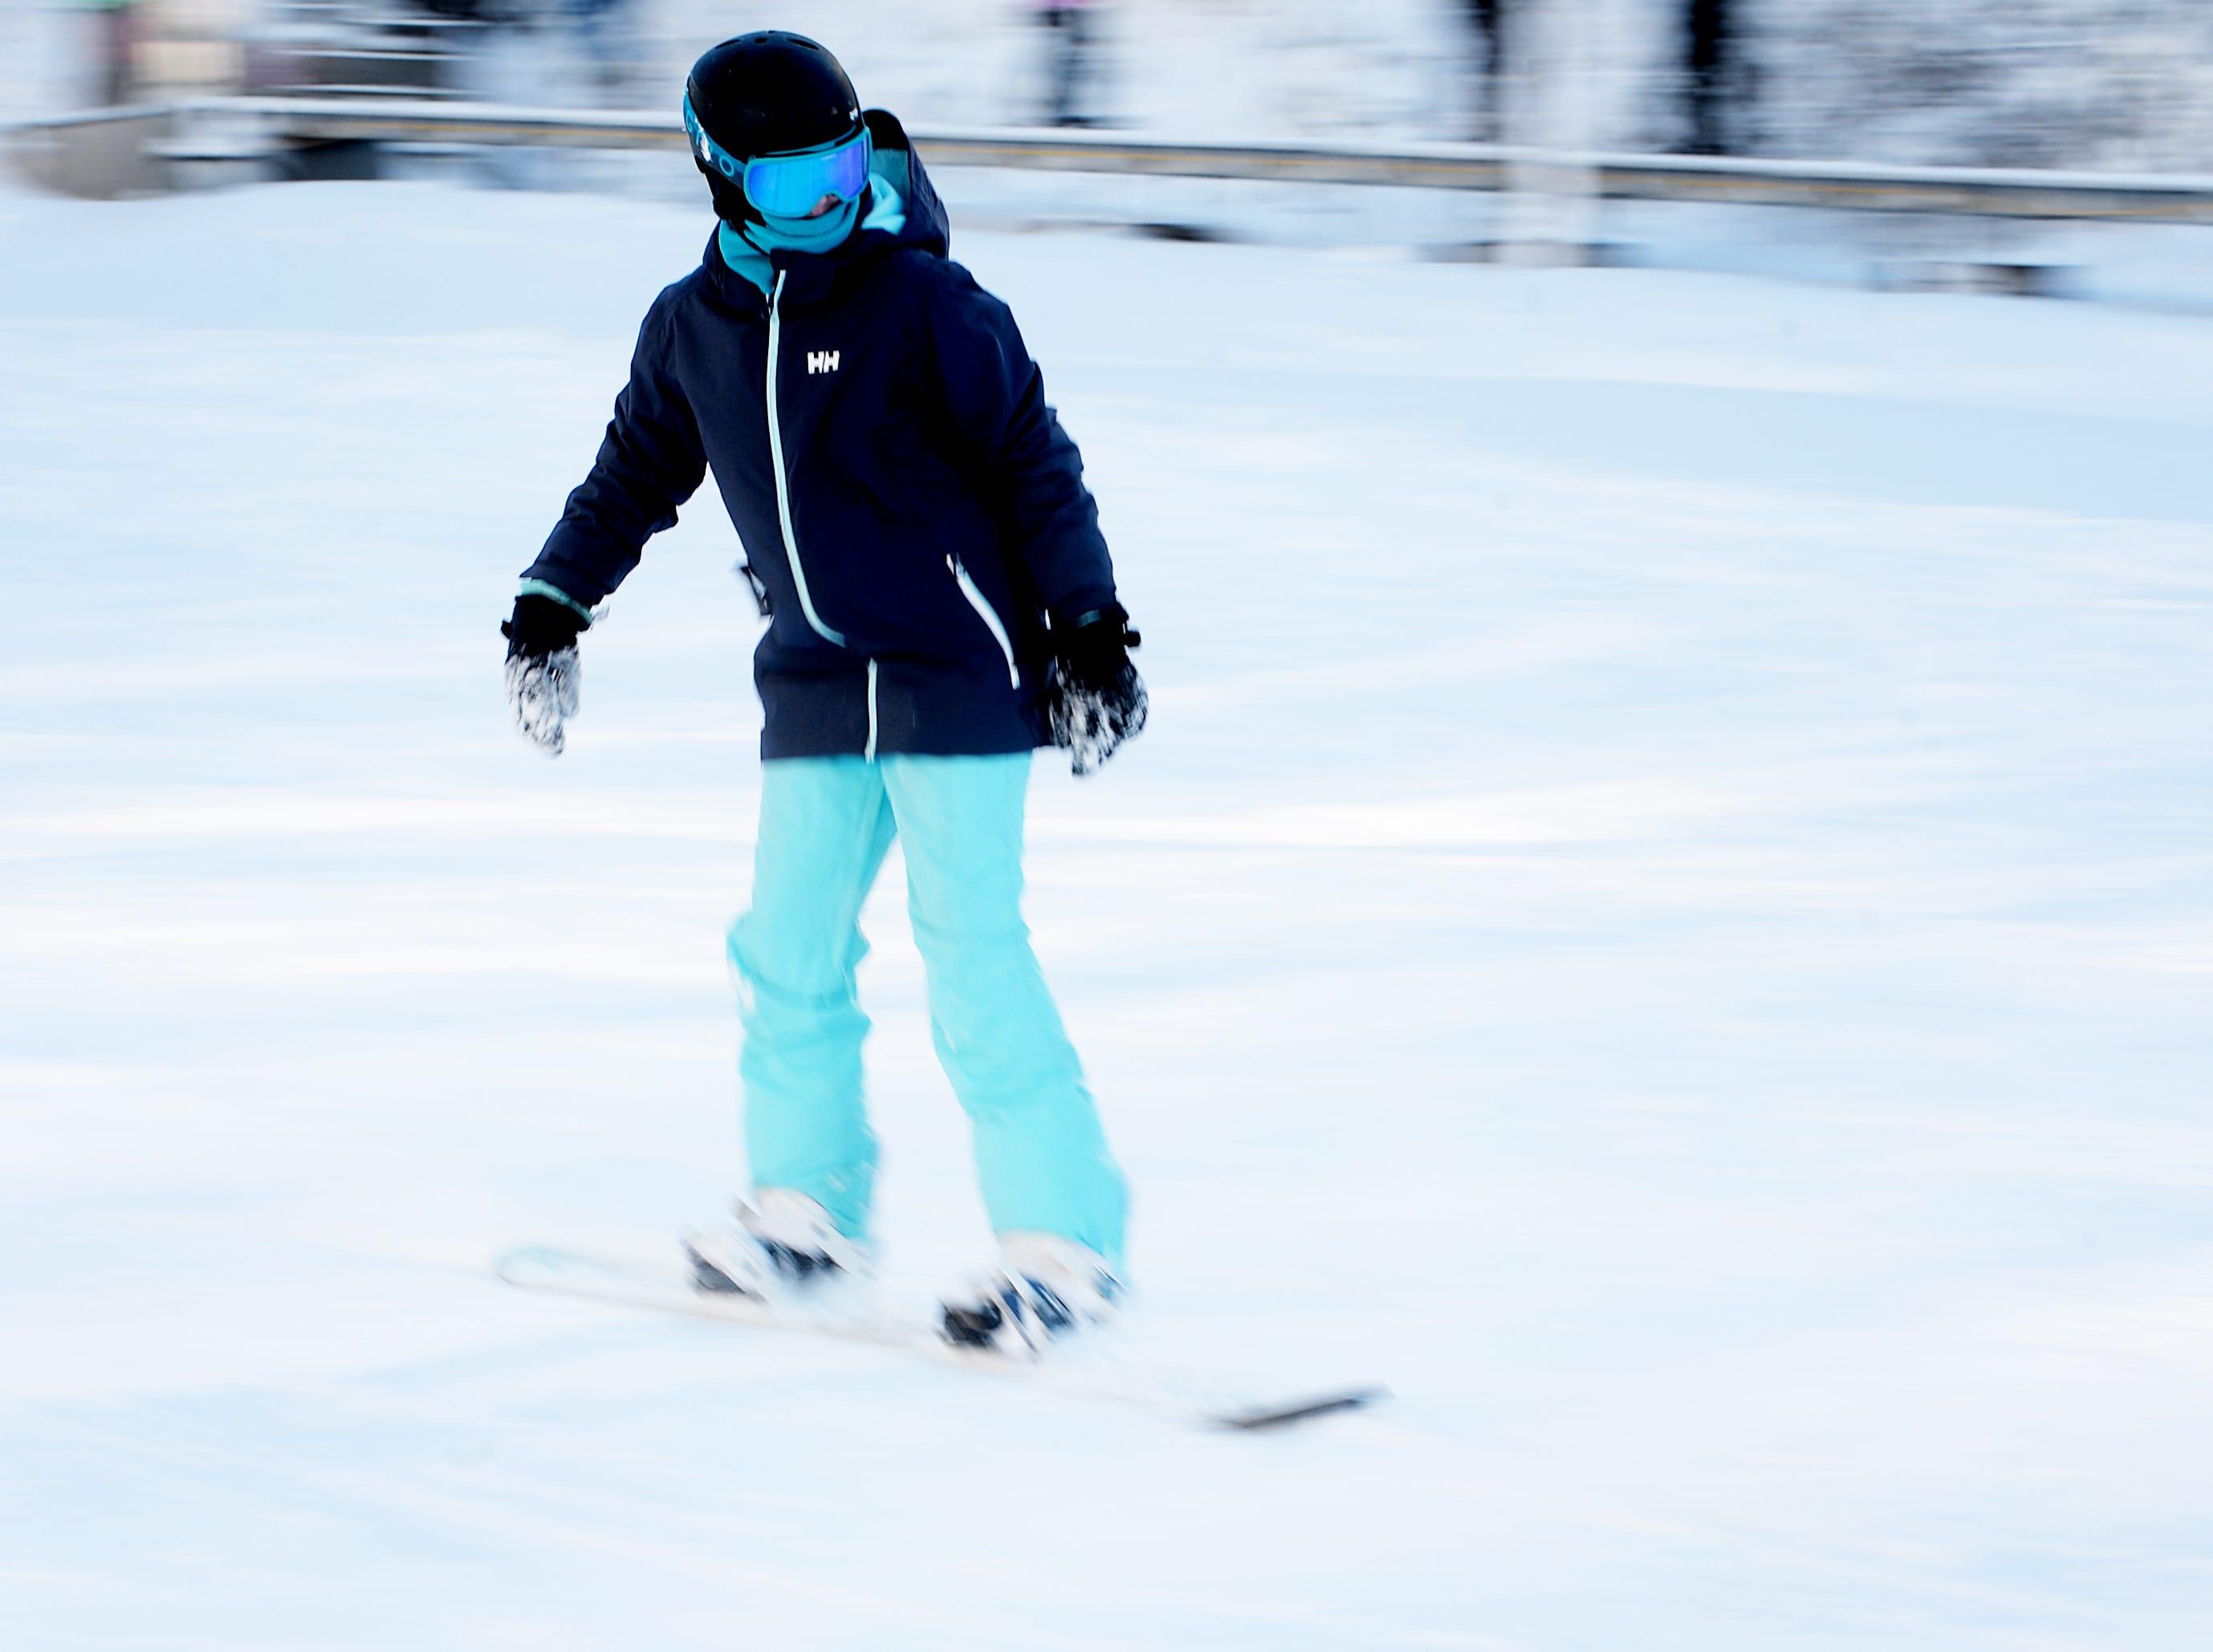 Skiers enjoyed fresh powder at Wolf Ridge Ski Resort in Mars Hill Dec. 22, 2018.